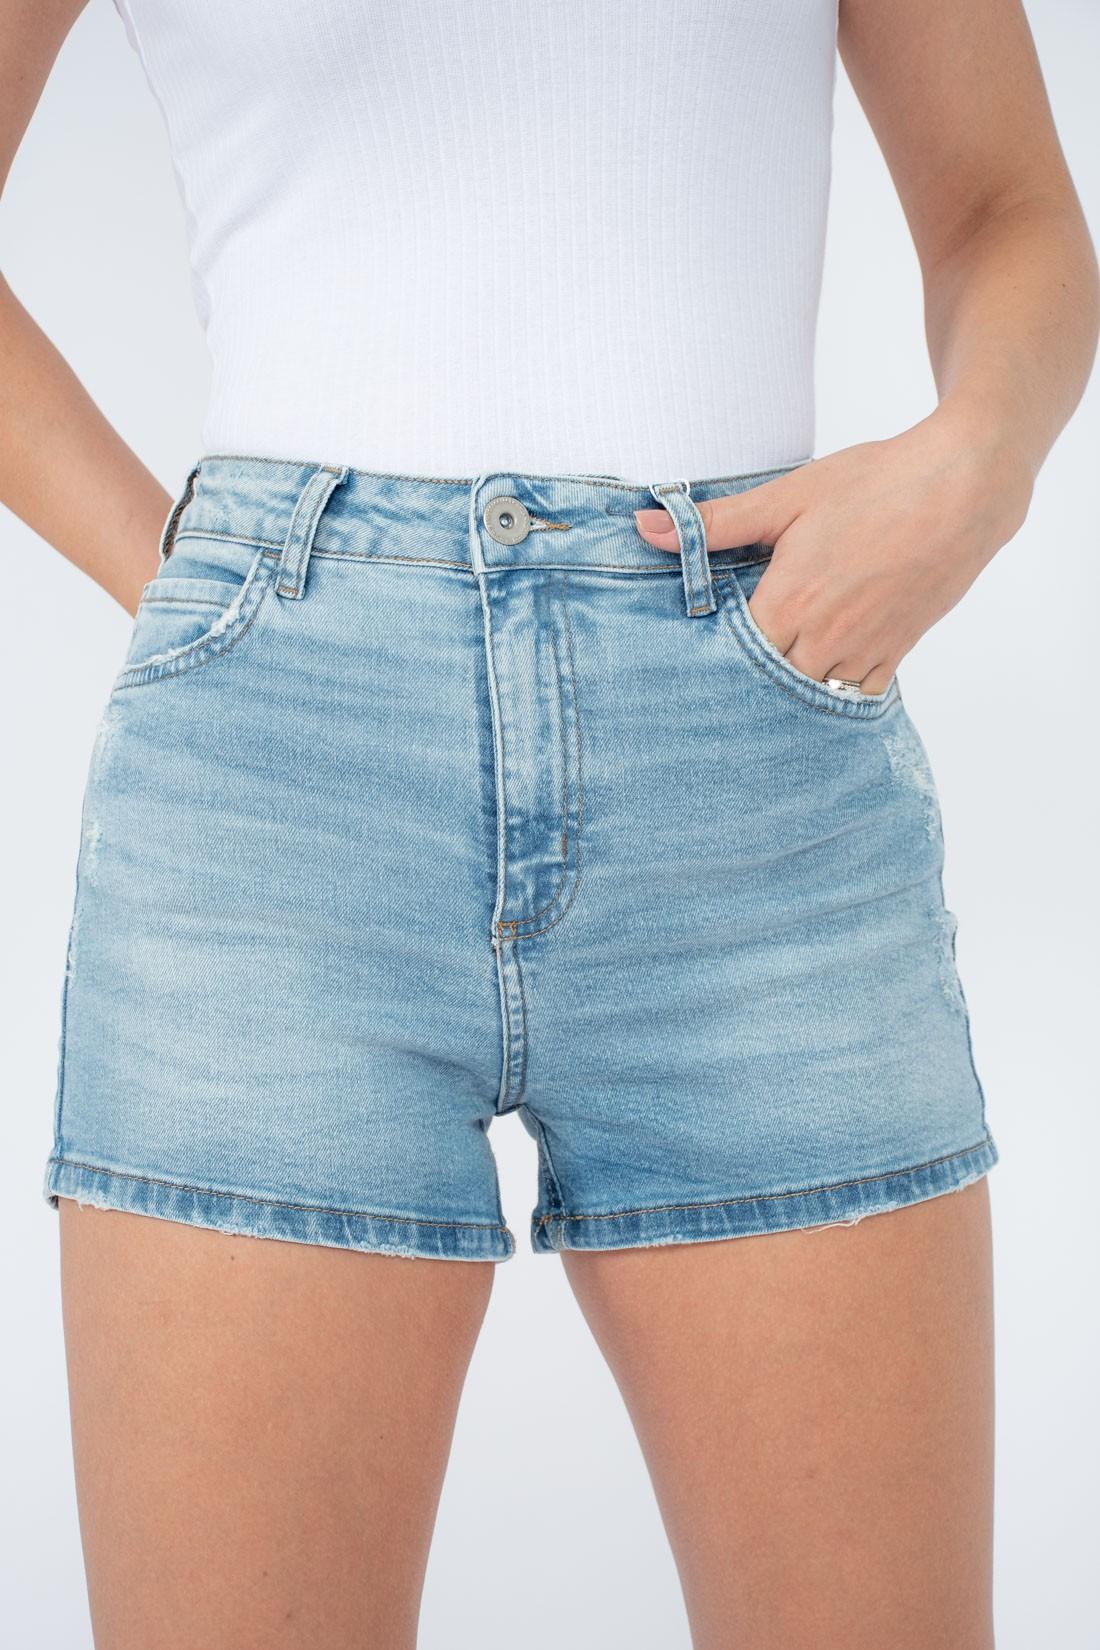 Shorts Jeans Colcci Tay